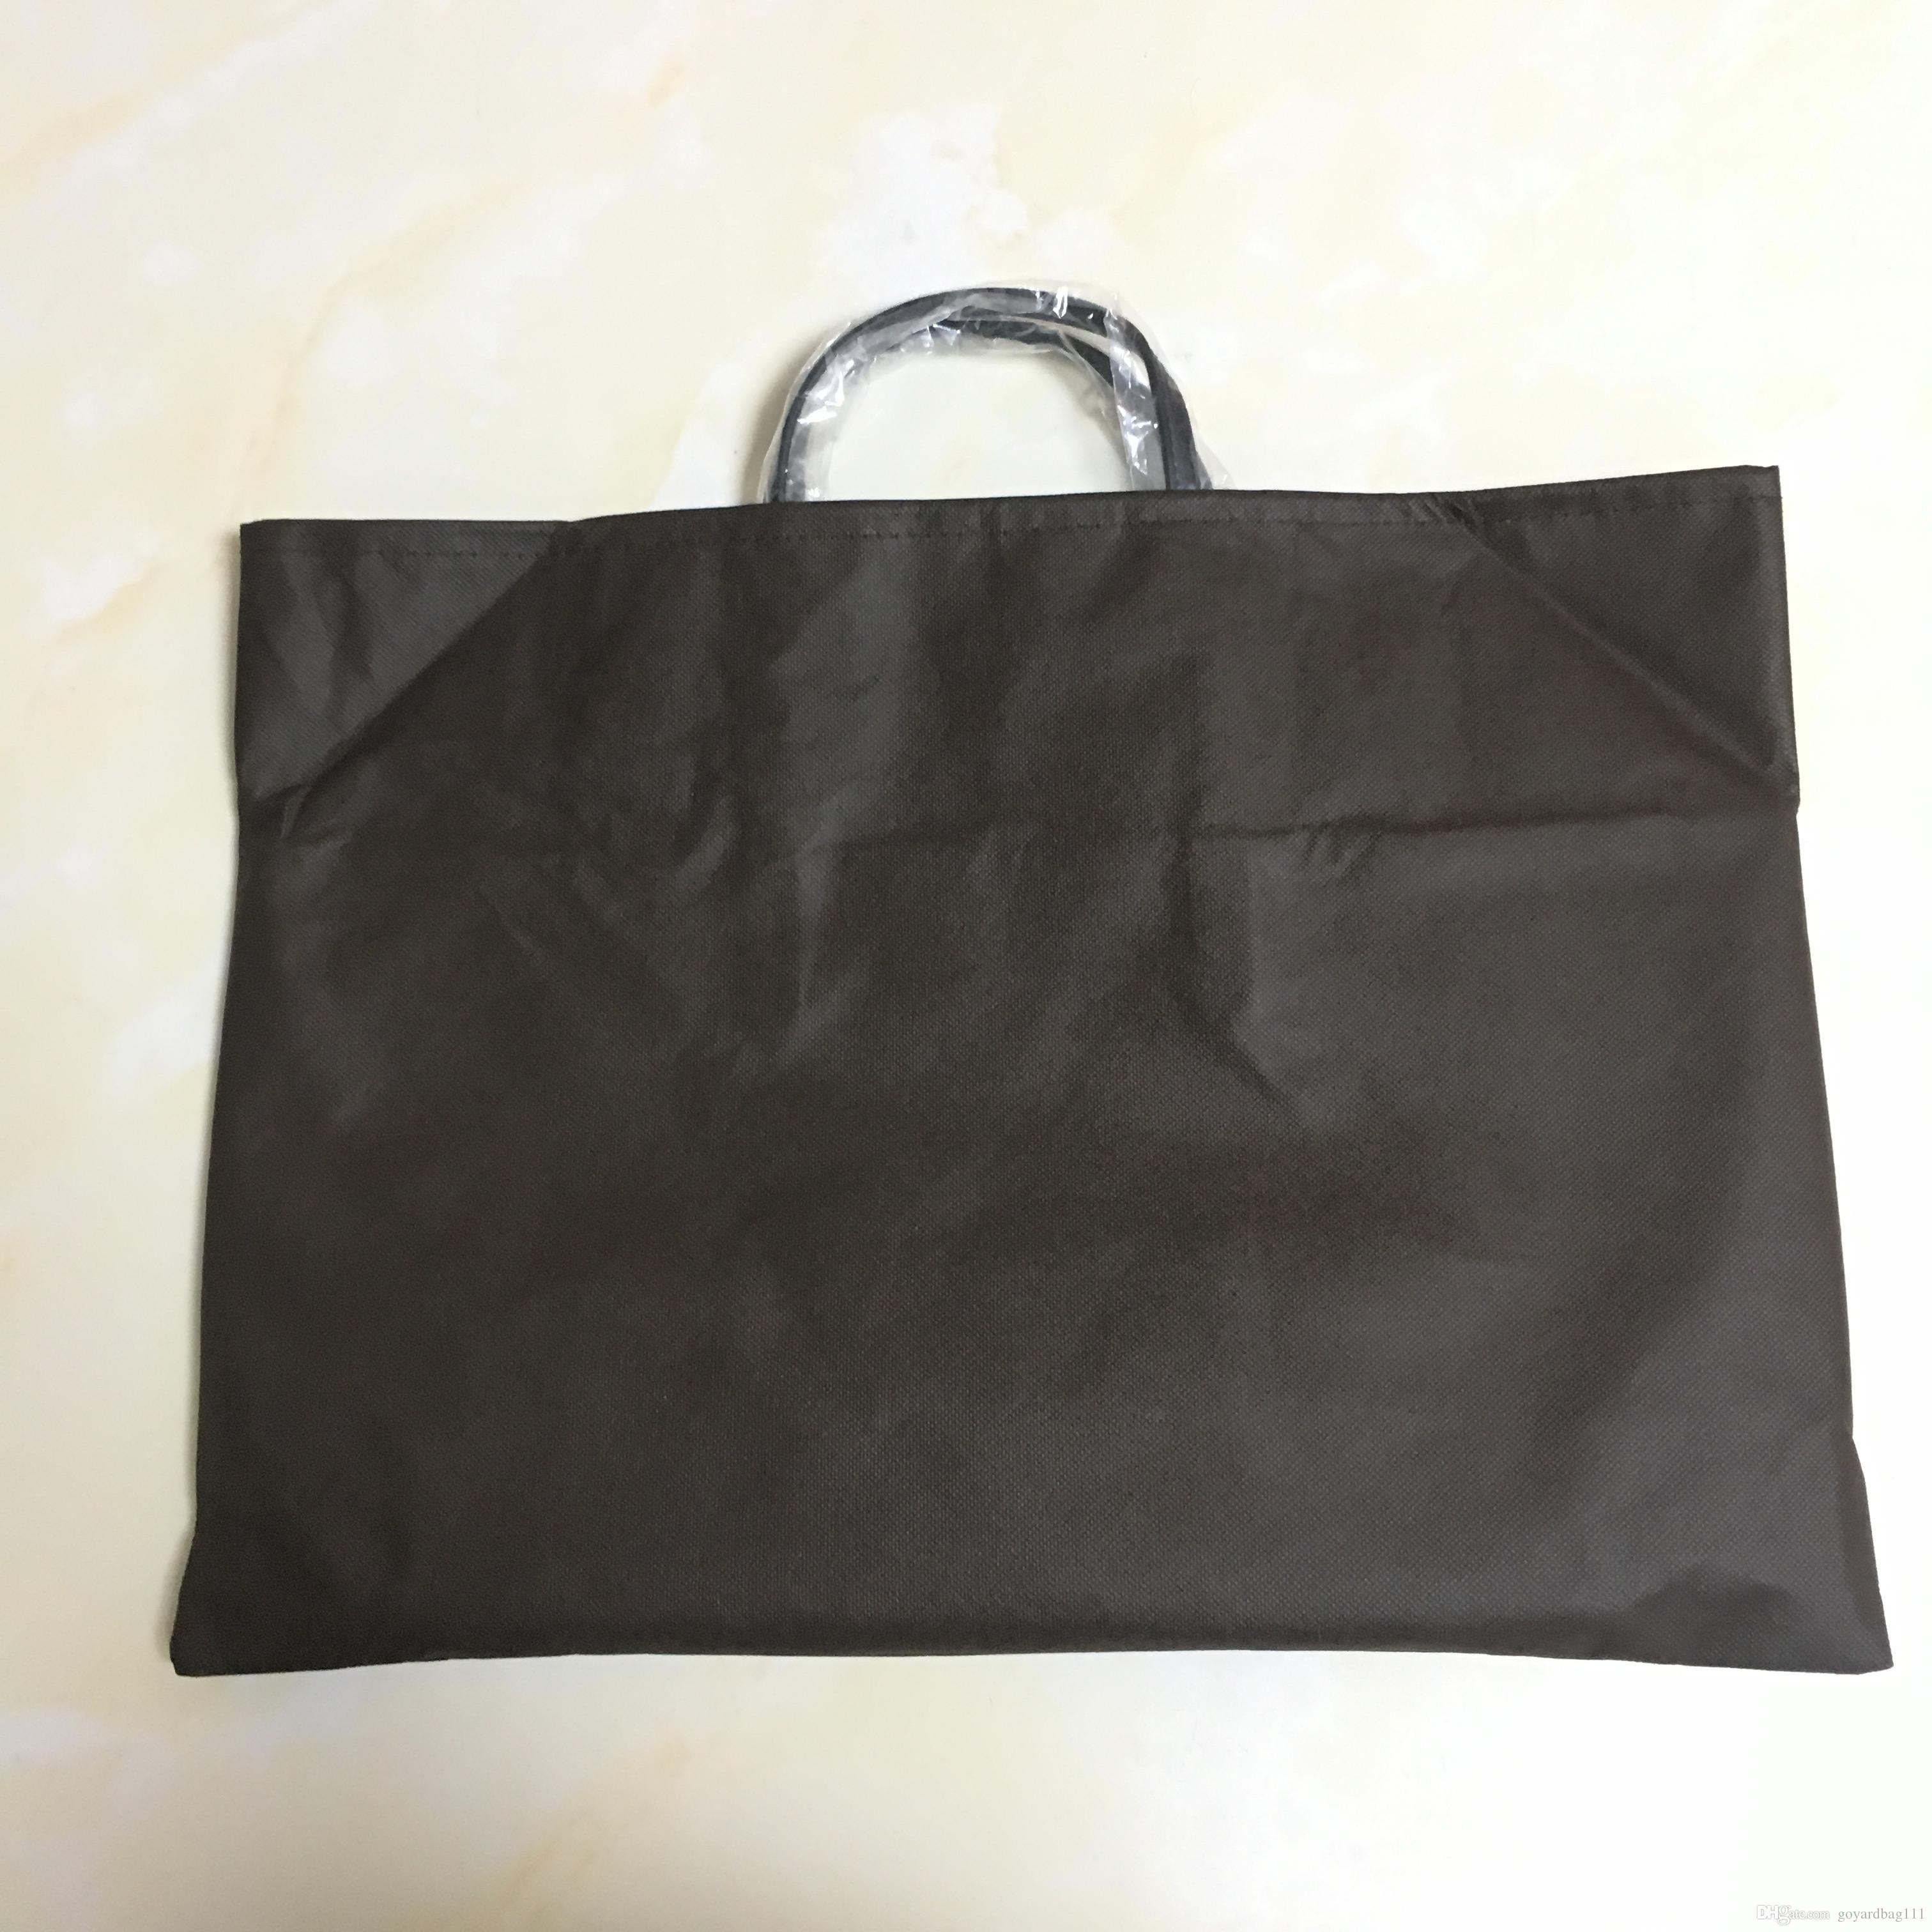 France paris style shopping bags Large and Medium Size Fashion women lady design handbag shopping bag totes